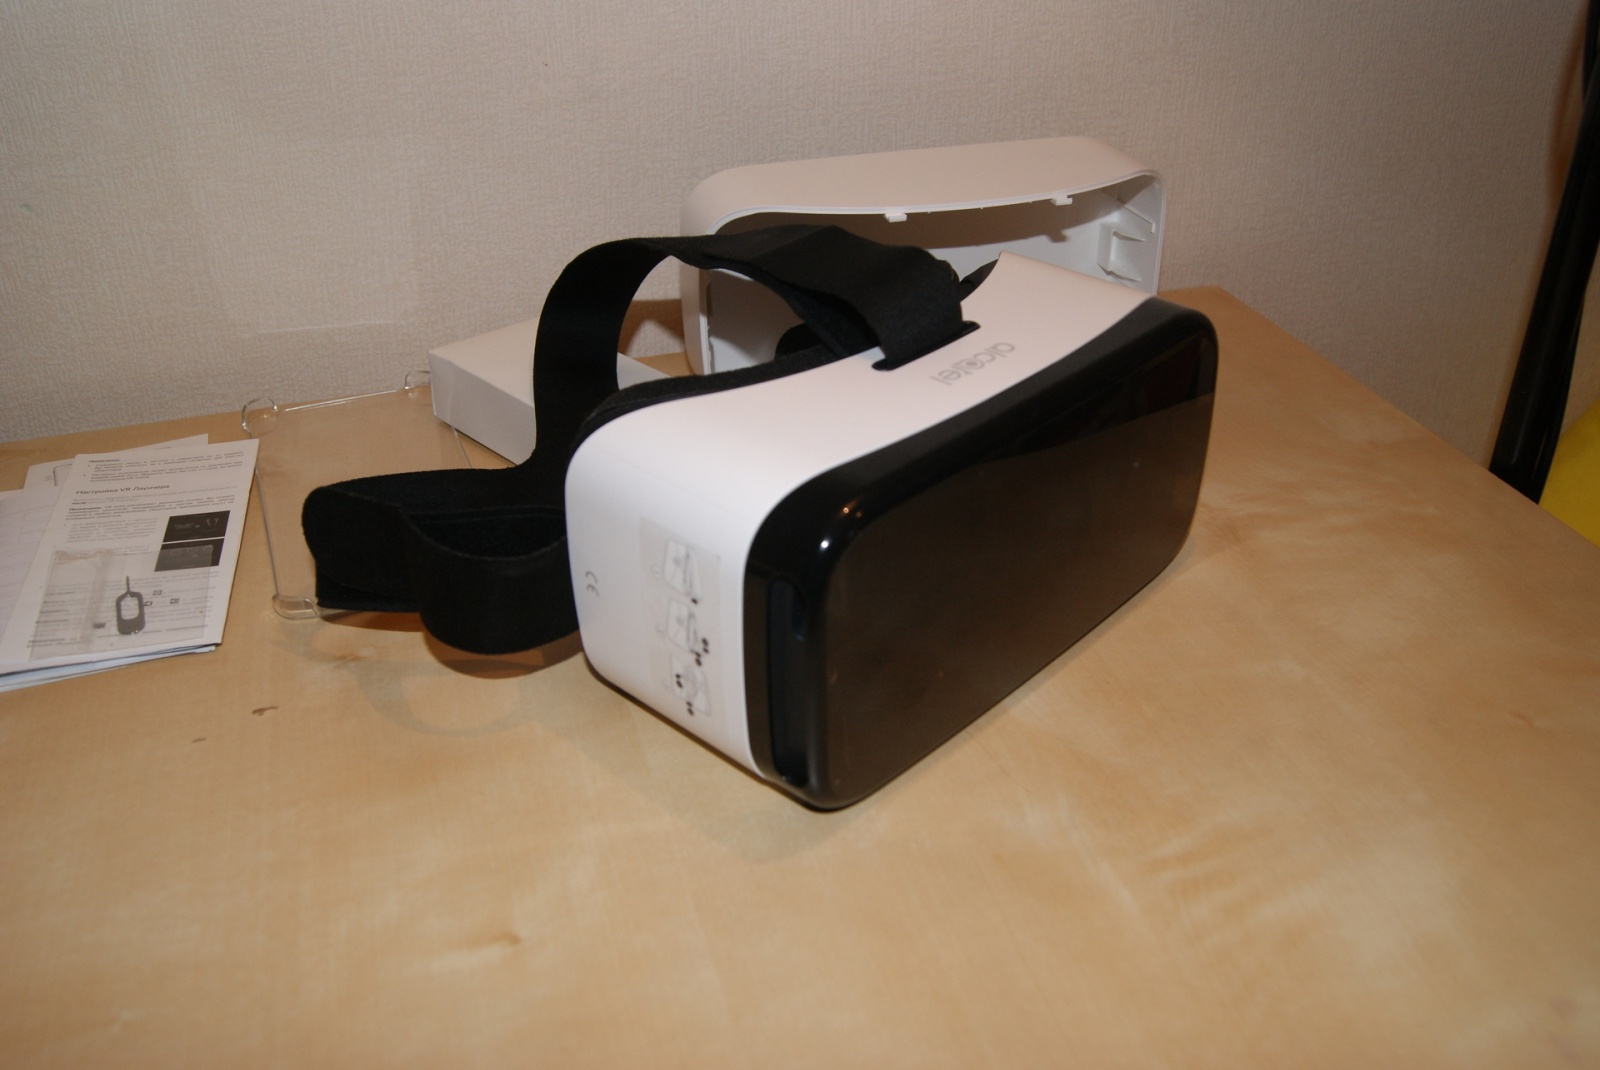 Обзор Alcatel IDOL 4S: виртуальная реальность из коробки - 21